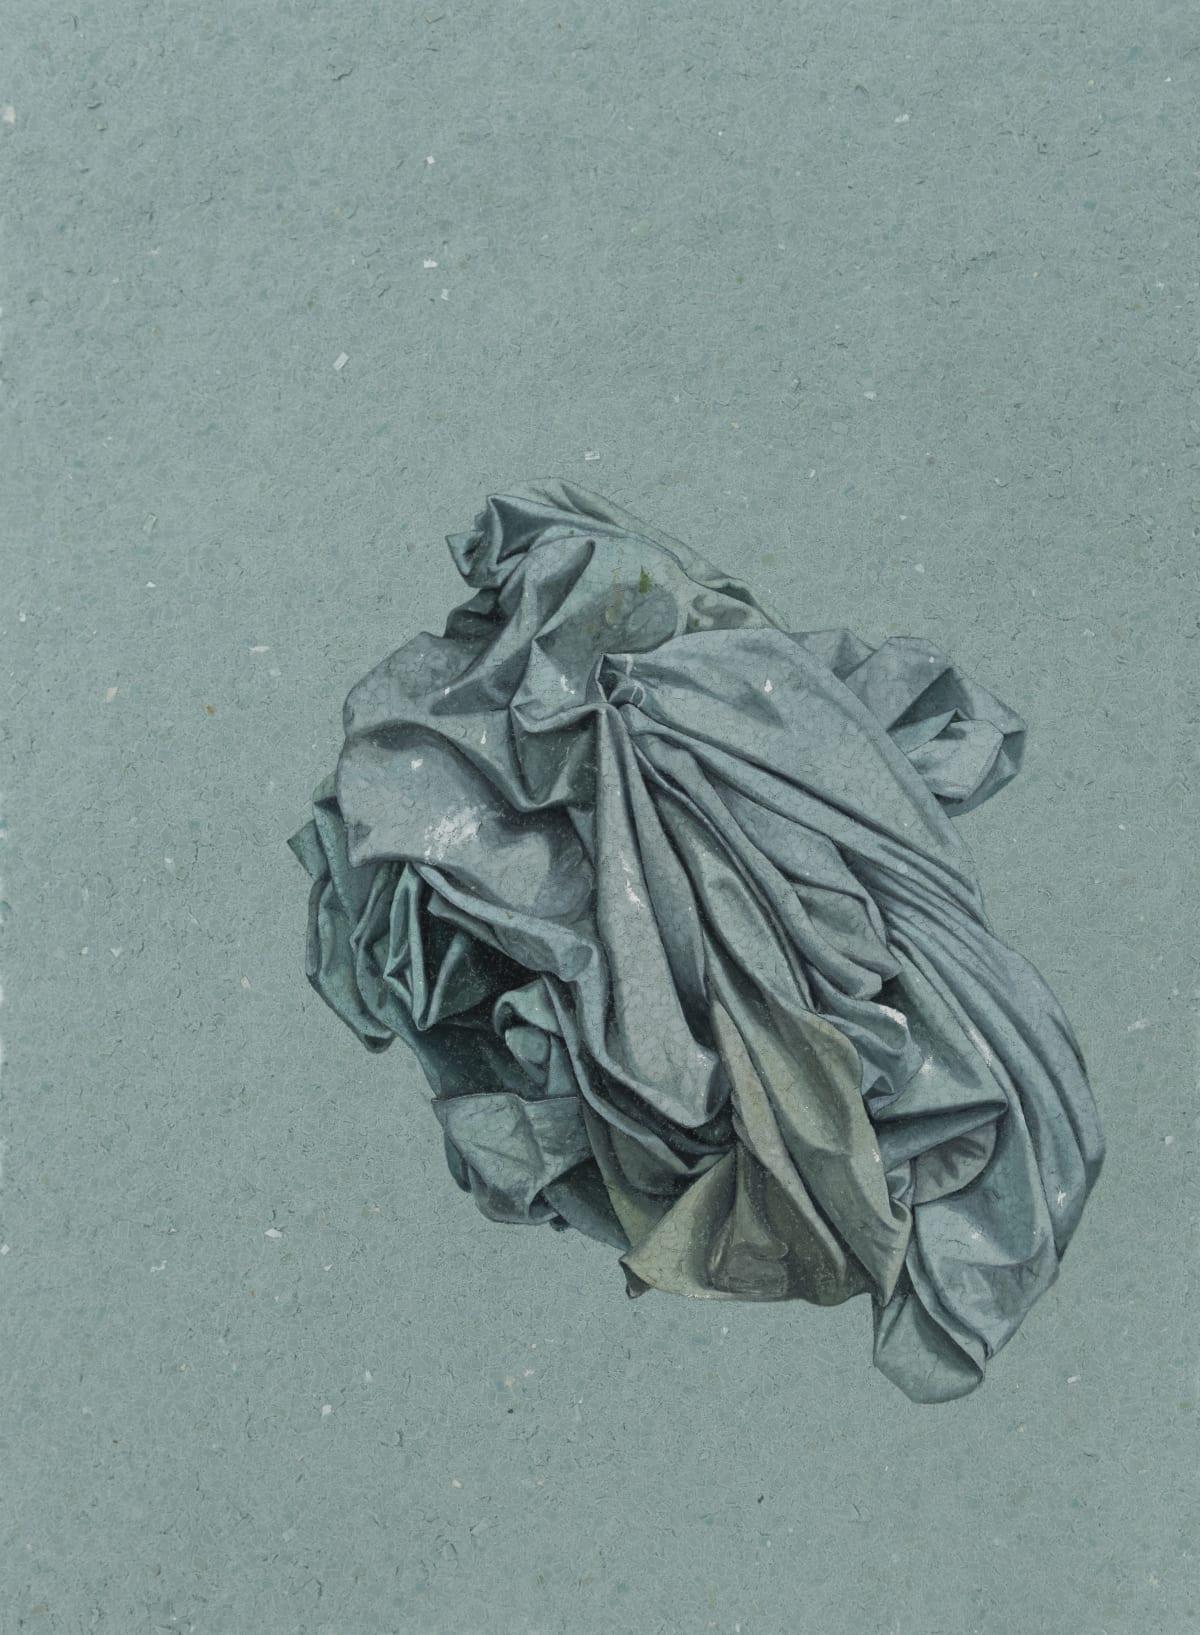 Marita Hewitt, Still Here (blue smoke), 2019